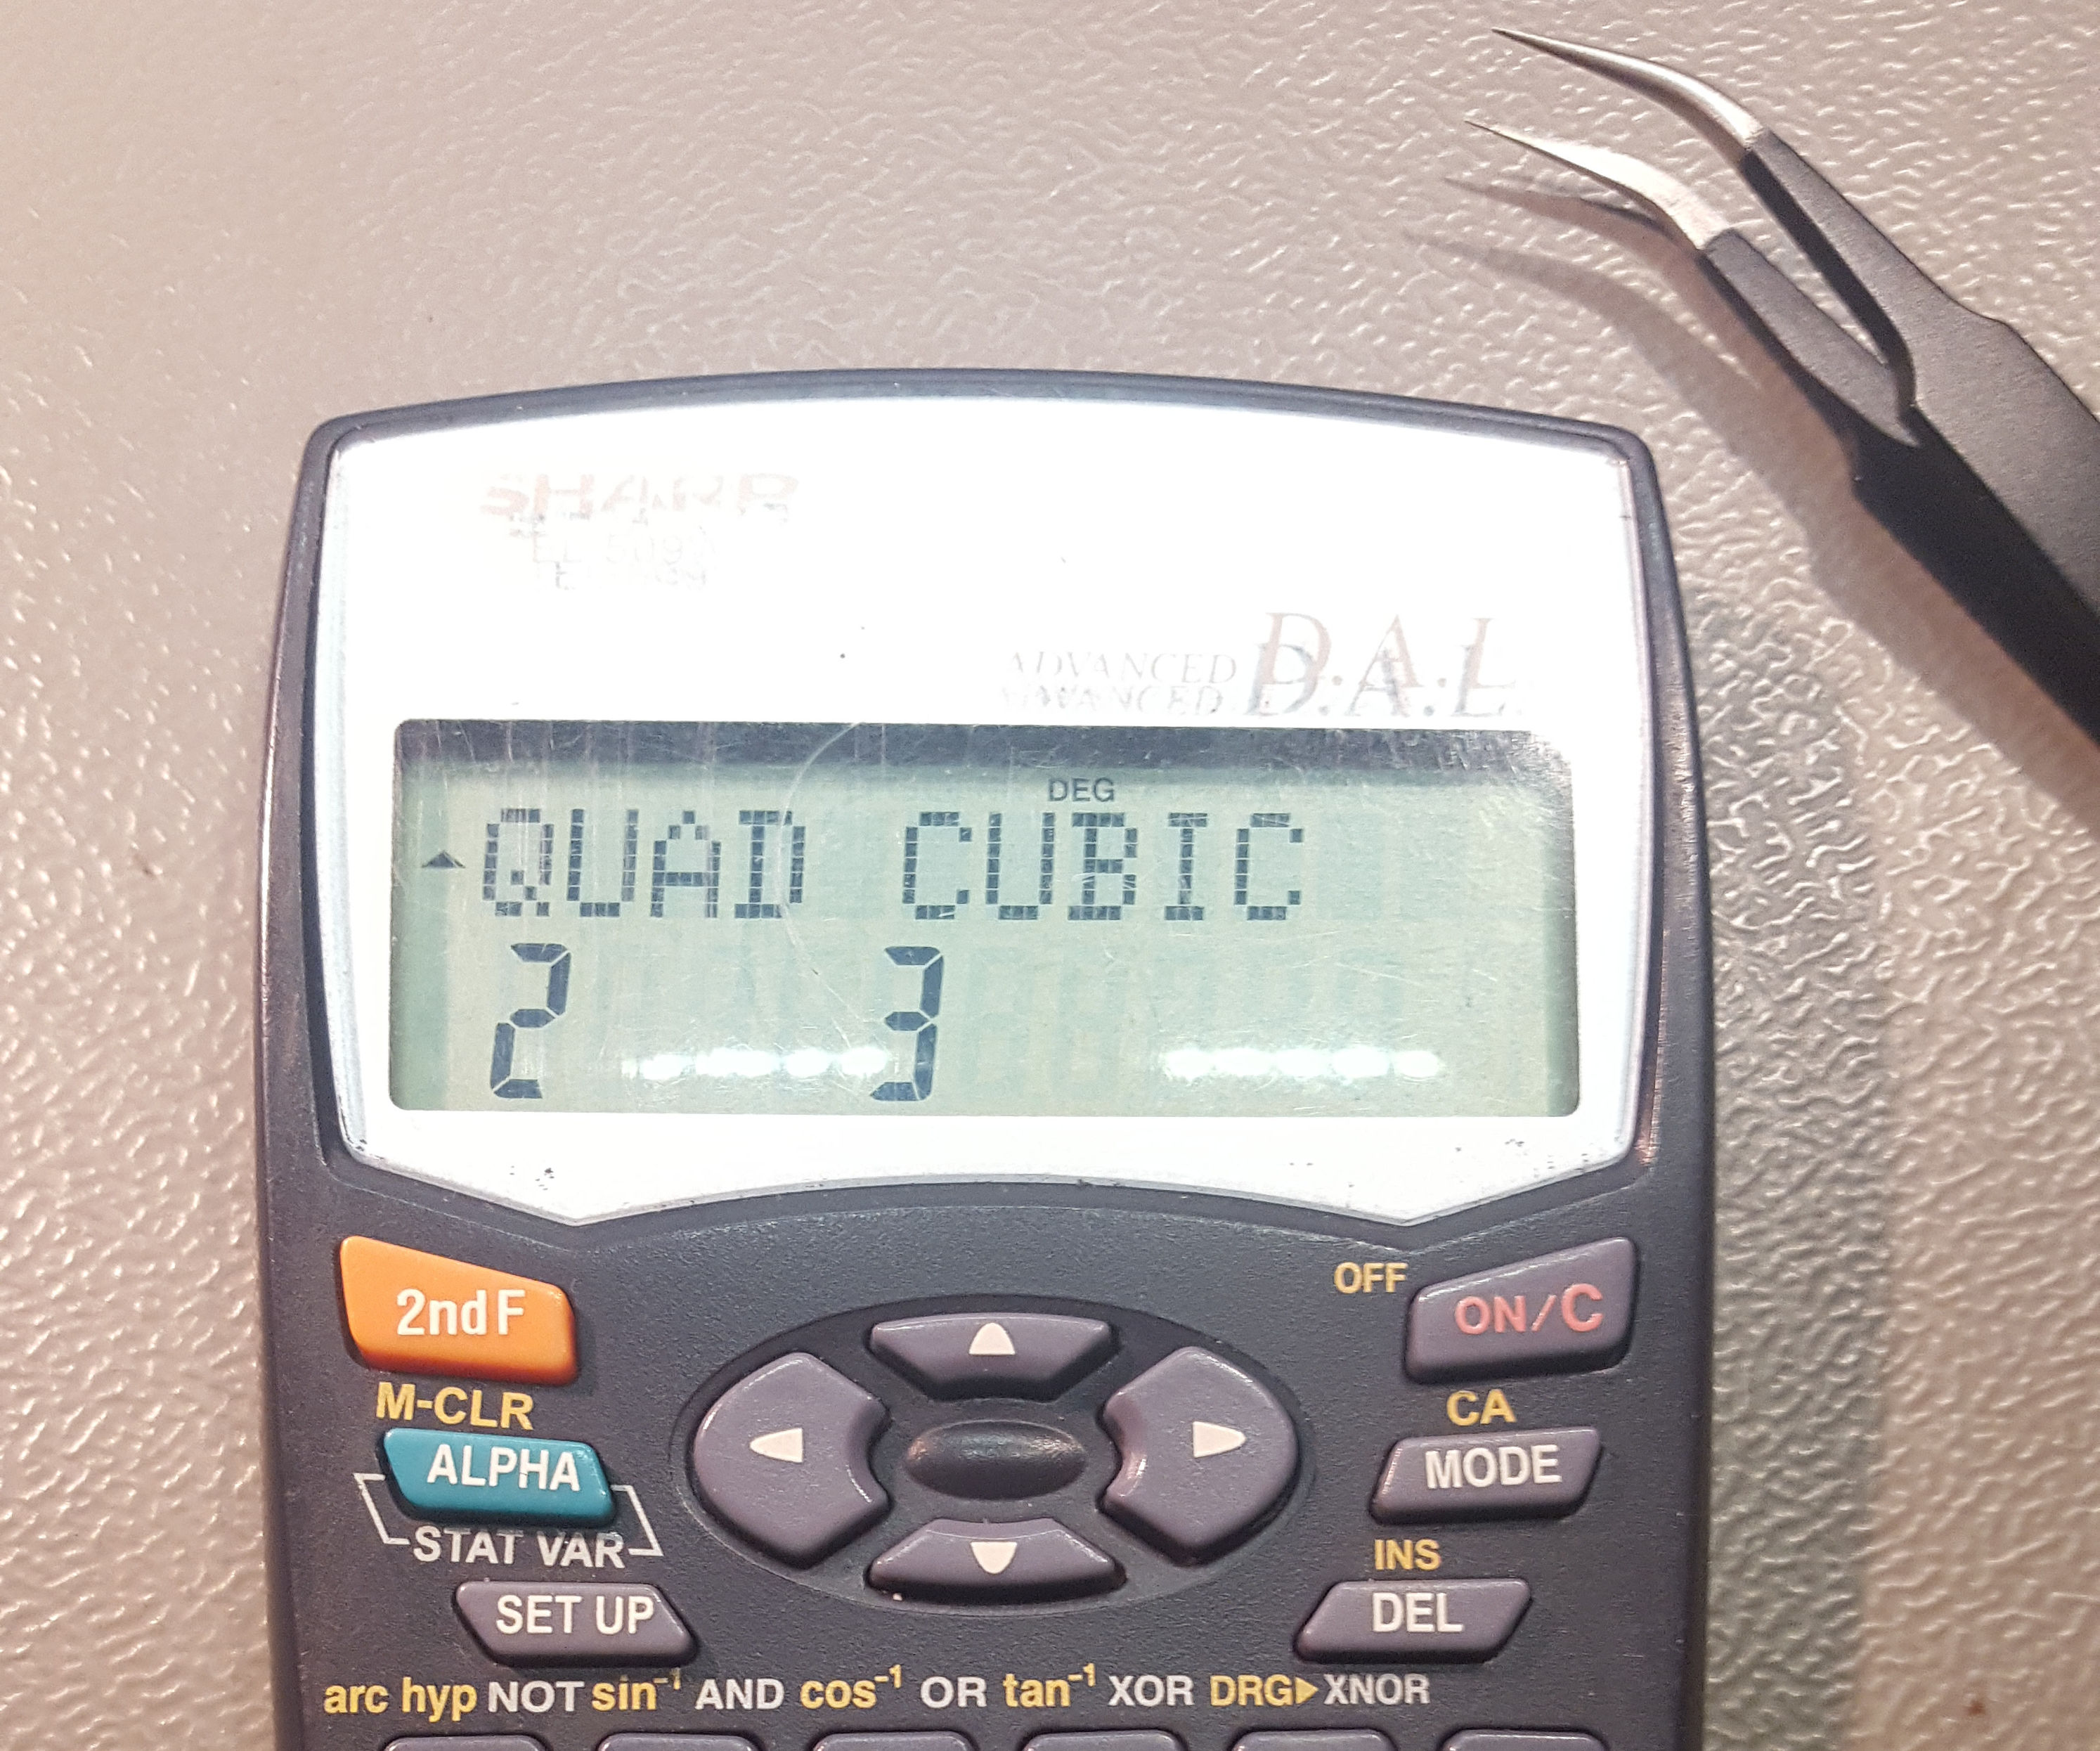 Sharp Calculator Hack